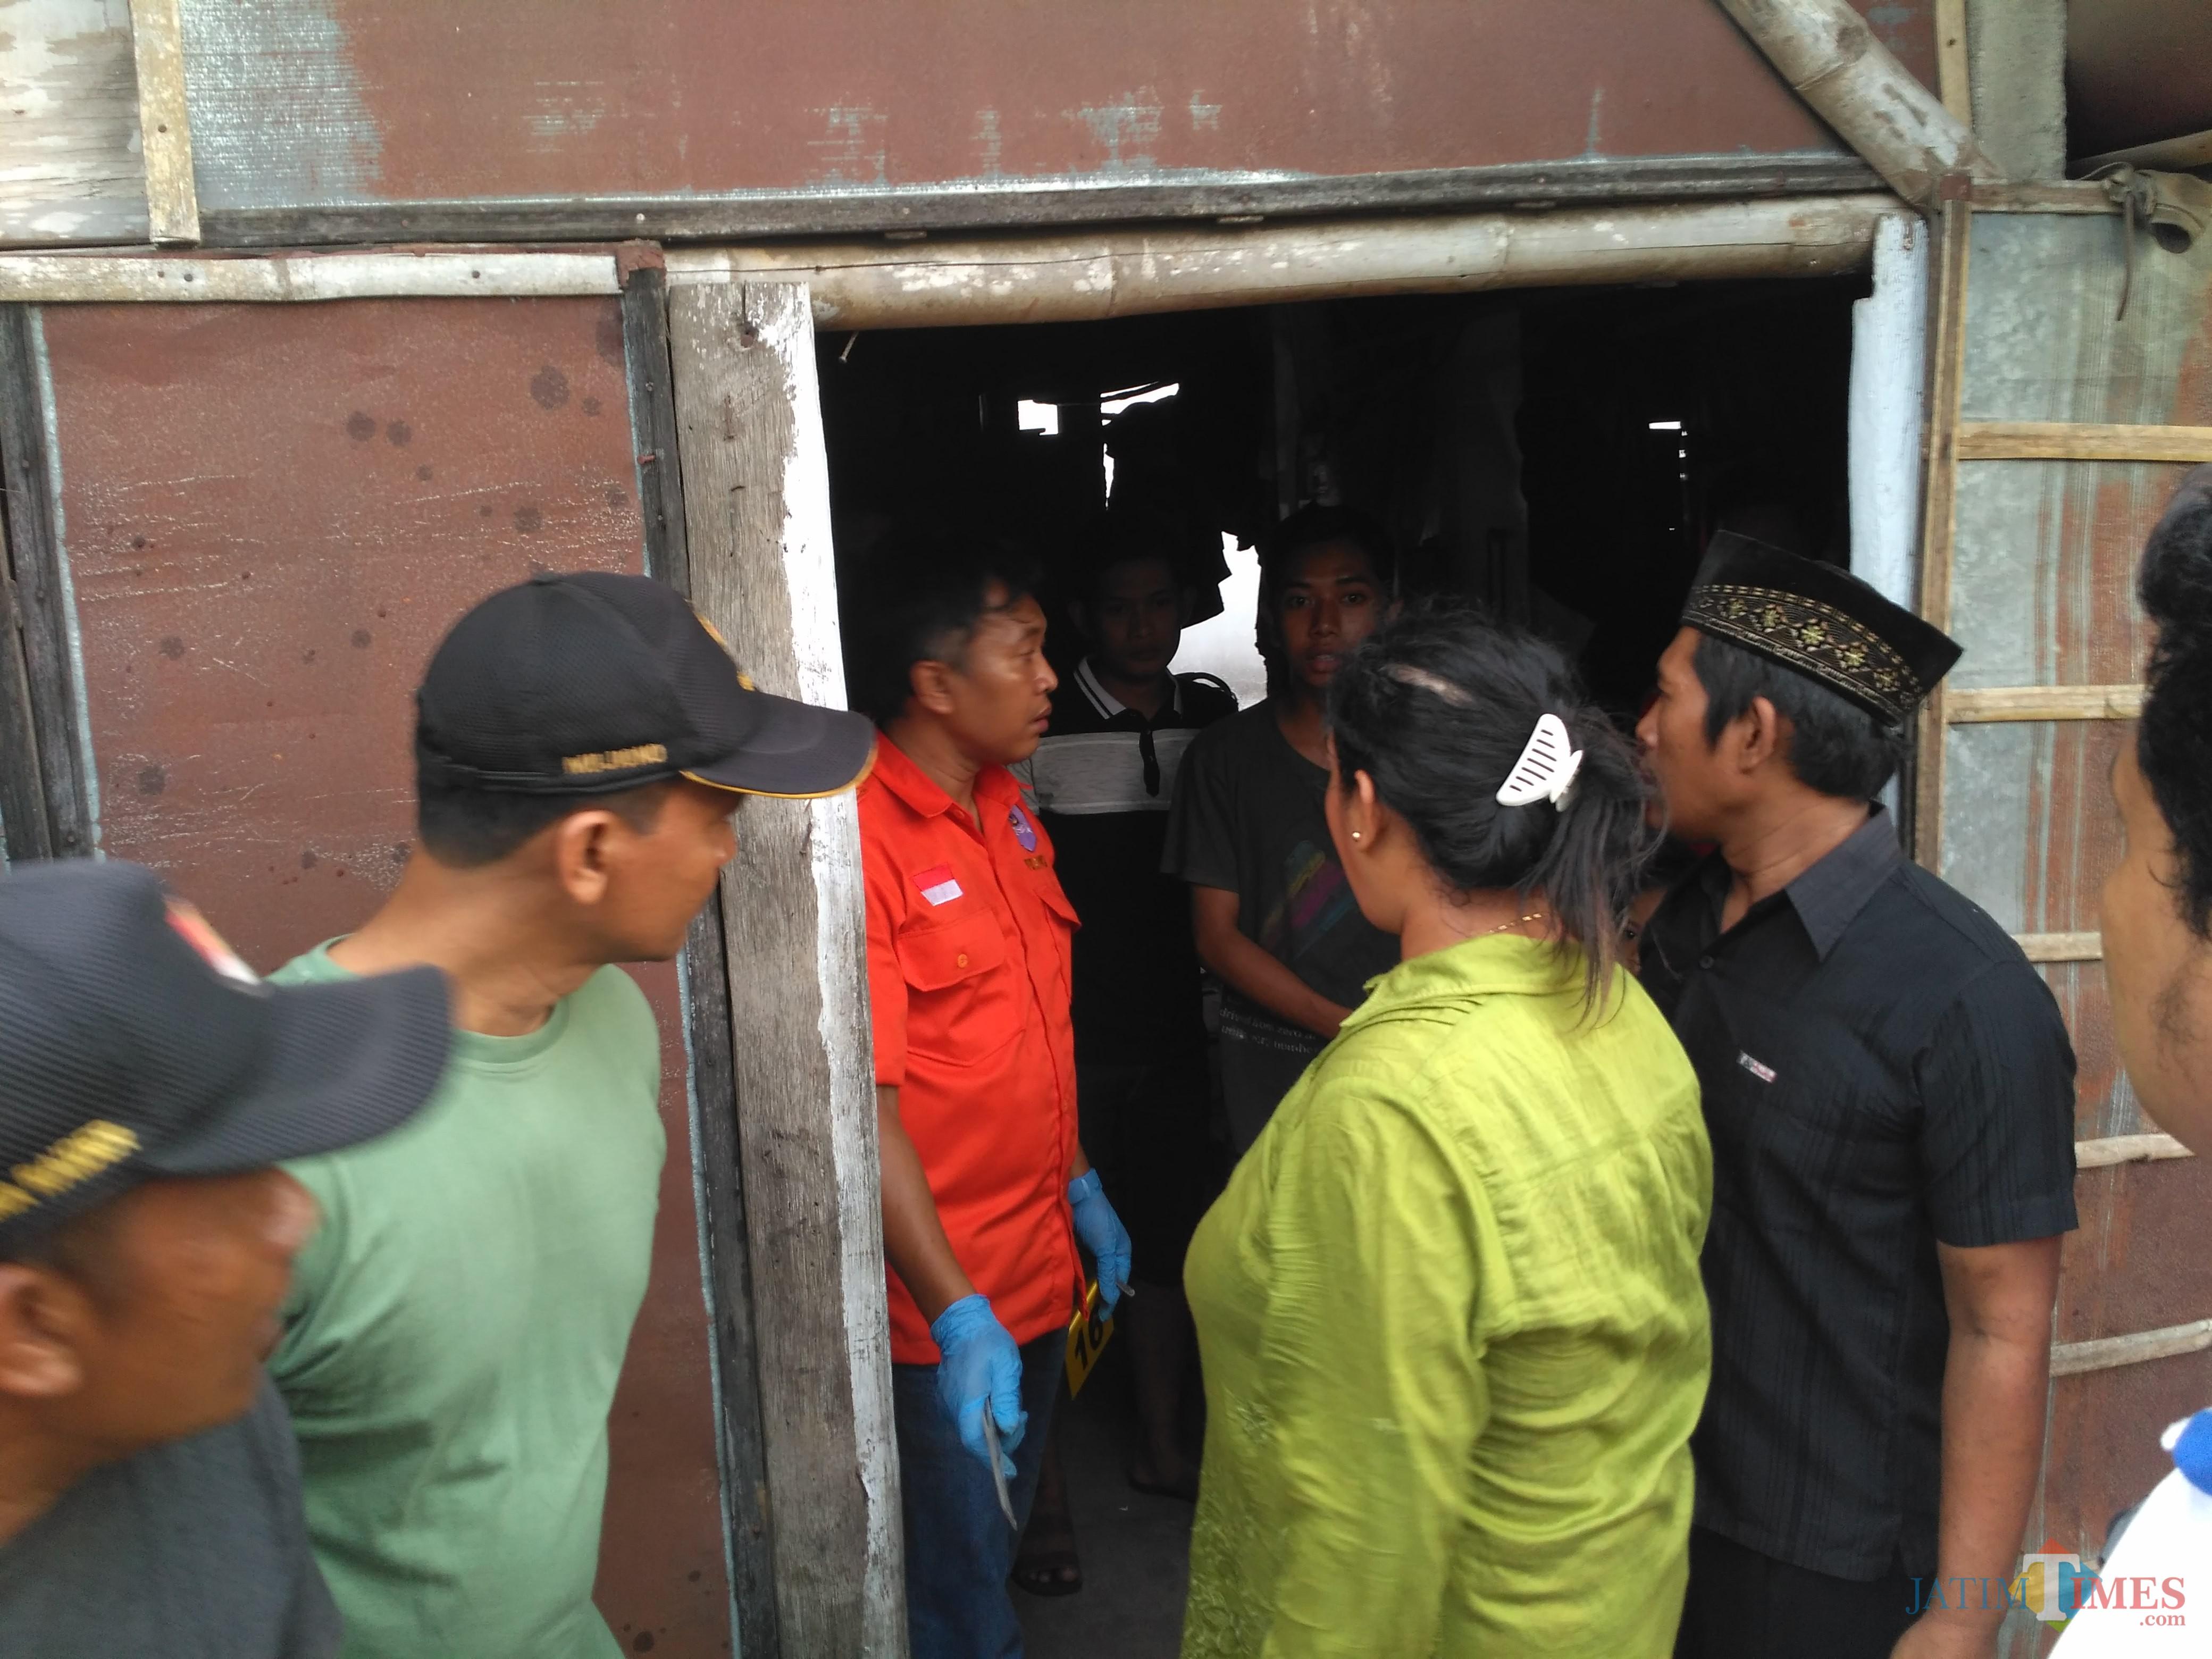 Keluarga berkumpul di dapur milik korban pasca pembunuhan, mereka minta pelaku di hukum seberat-beratnya / Foto : Anang Basso / Tulungagung TIMES